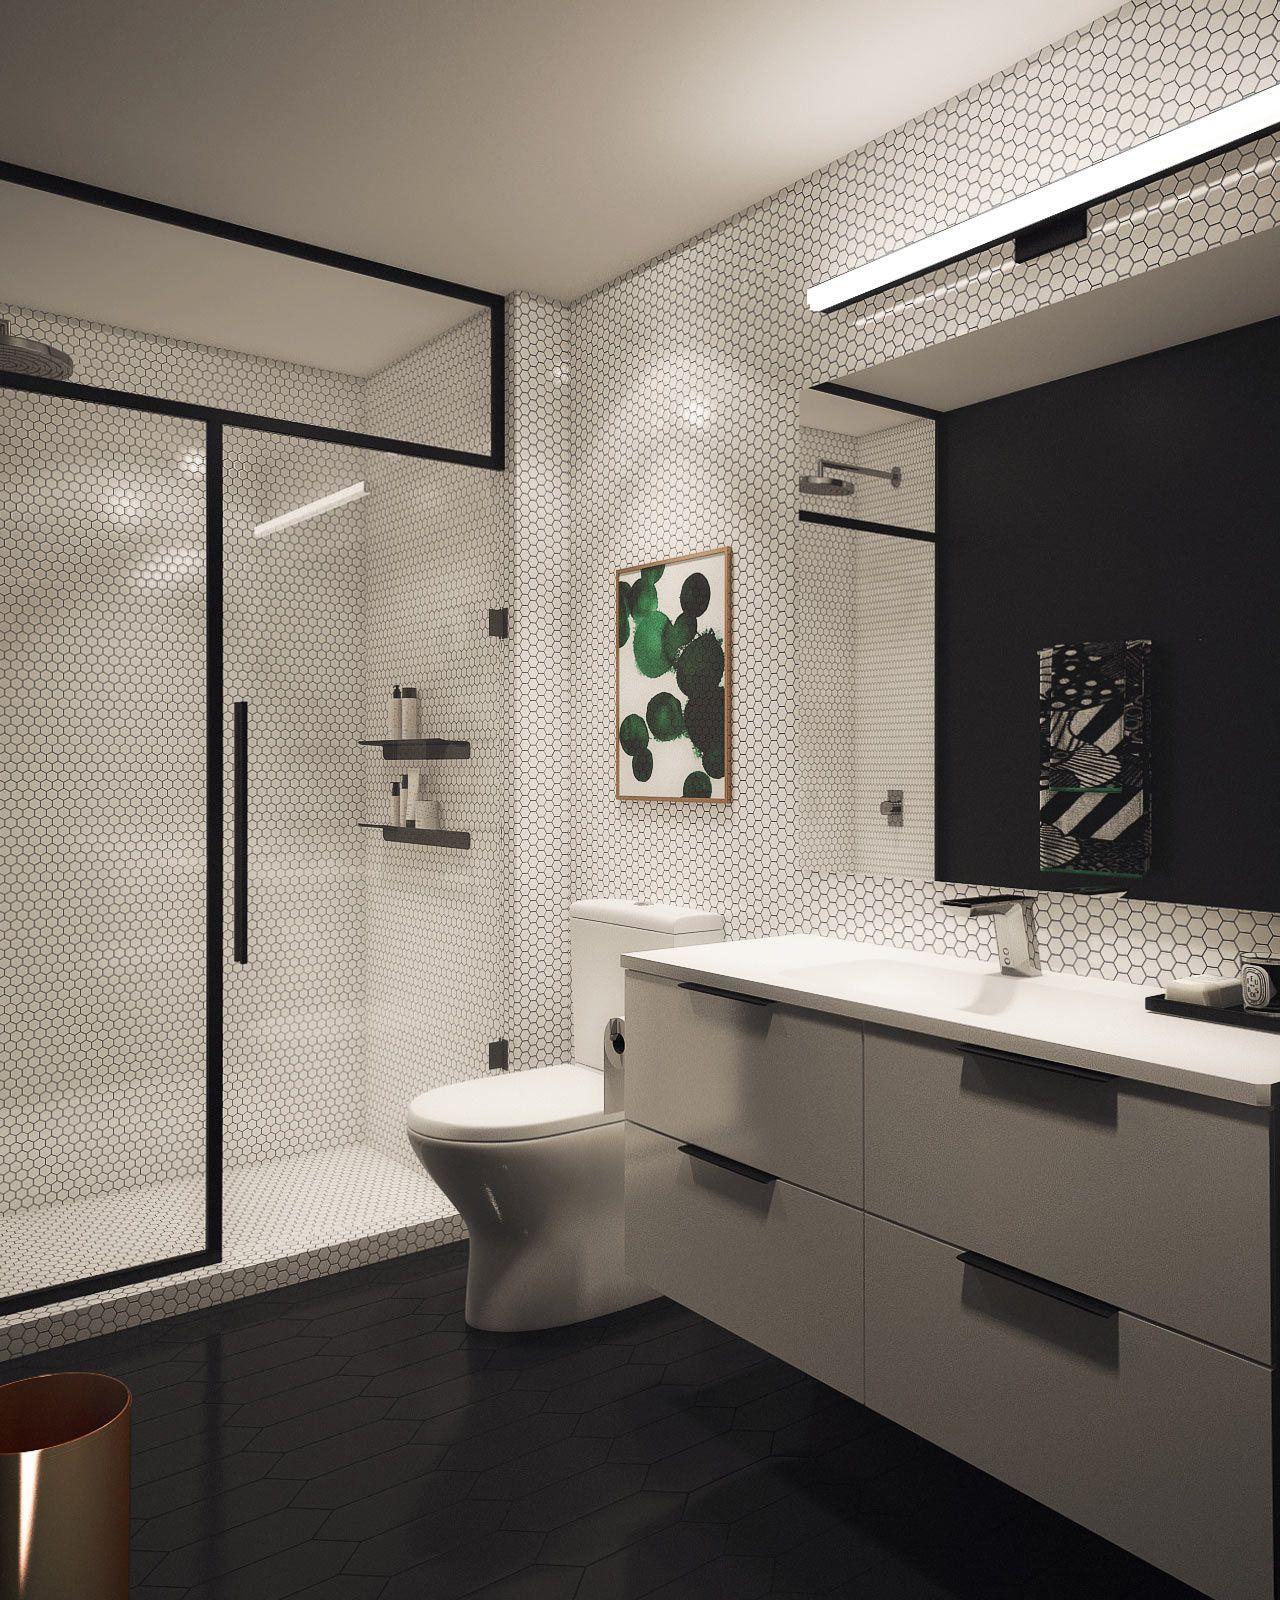 Basic Bathroom Gets A Graphic Modern Renovation Modern - Modern custom houseboat graphics